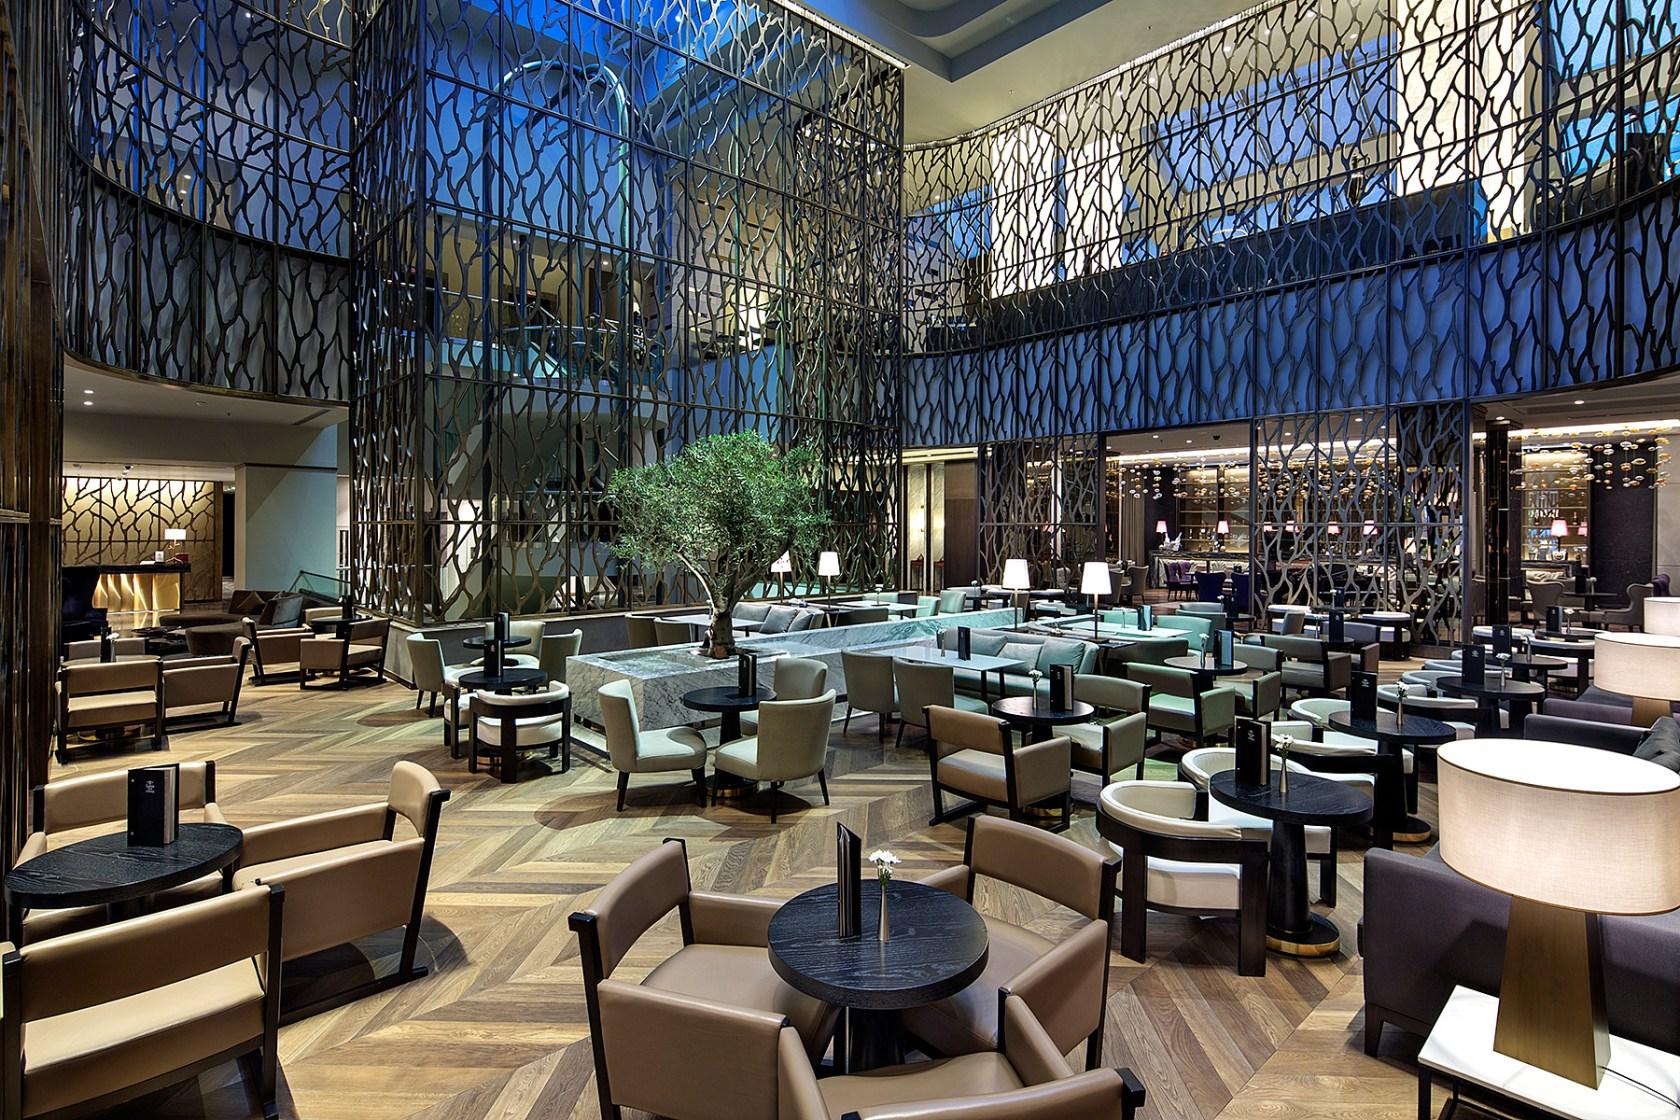 Hilton Ankara - Architizer